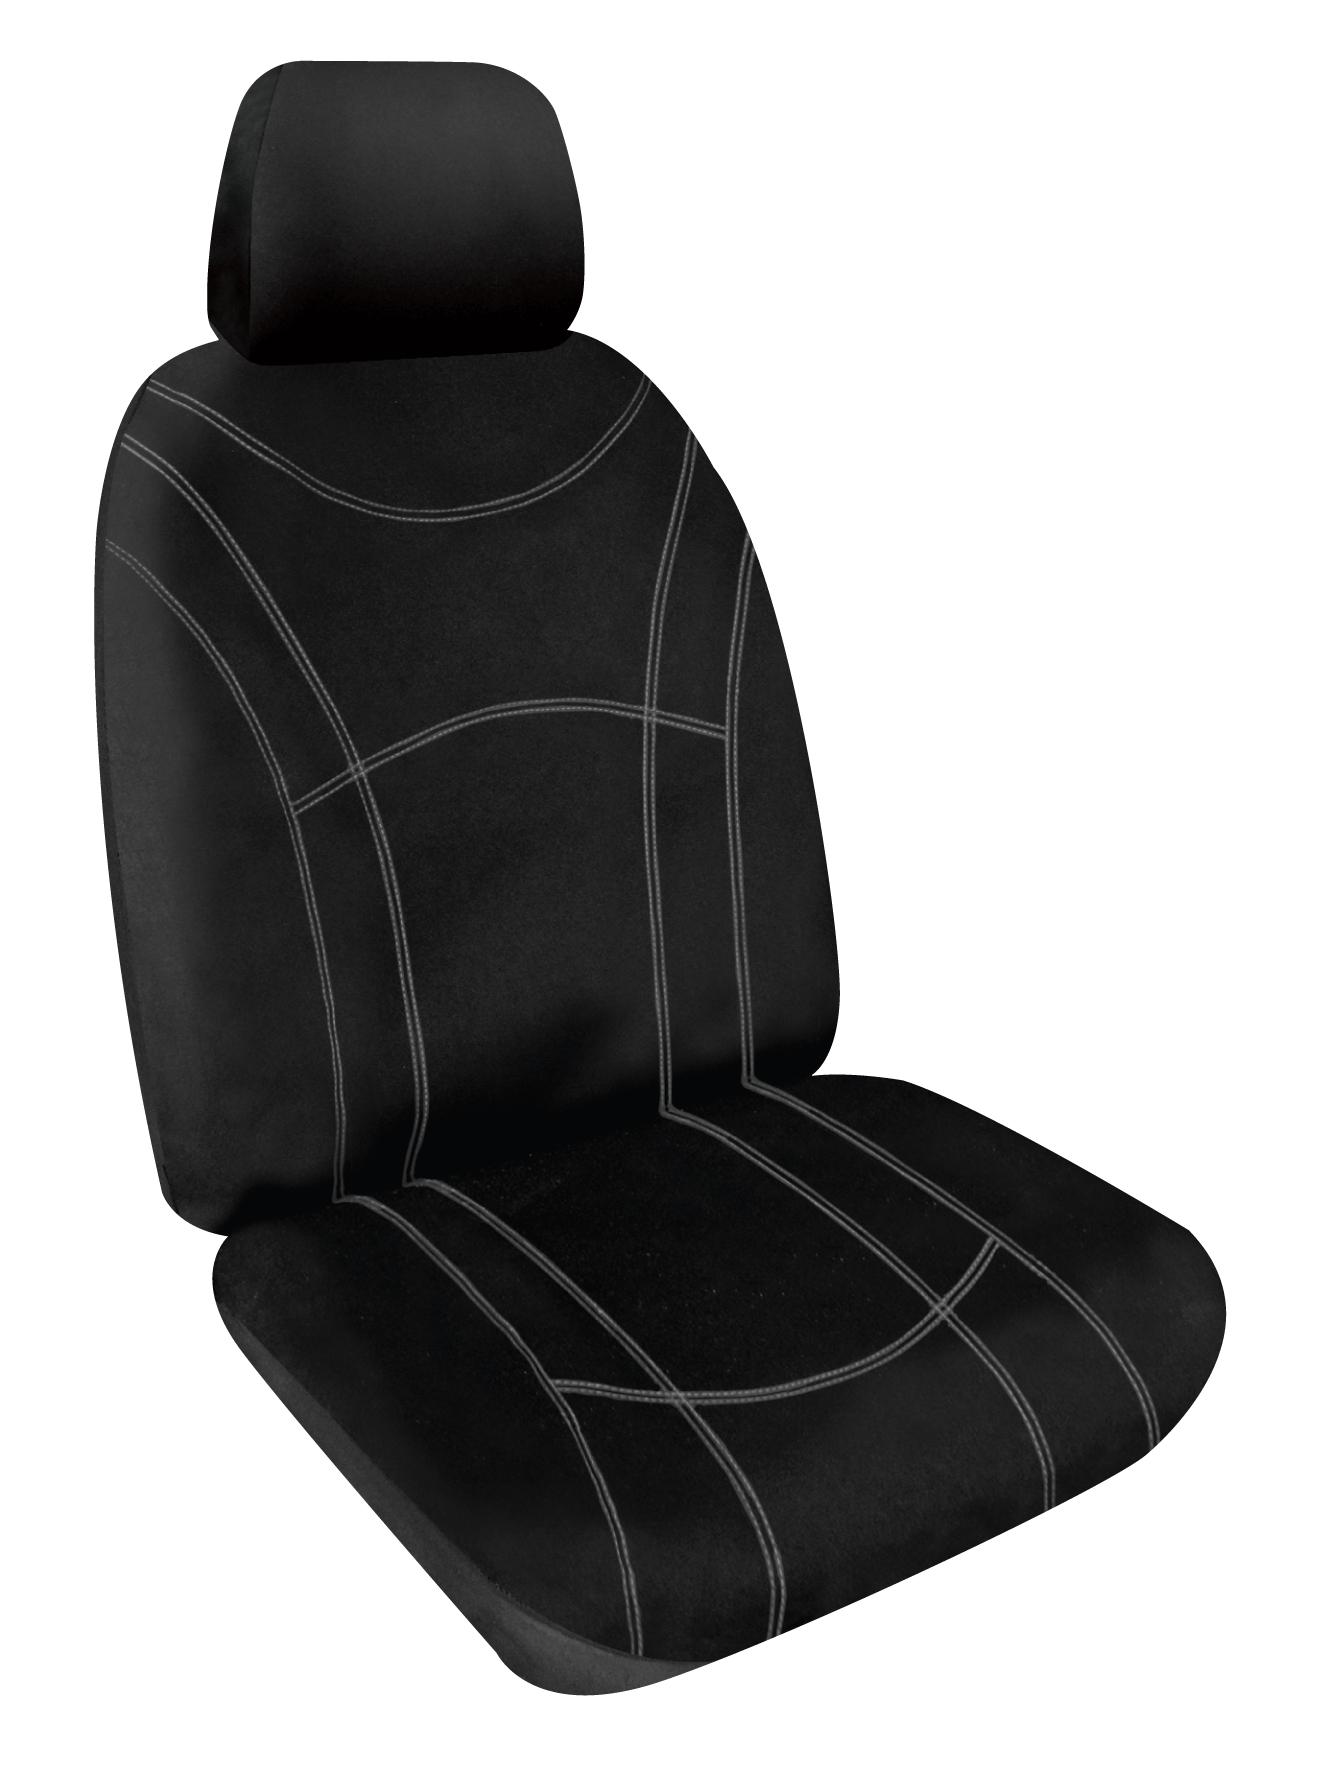 cobra modern and retro style sport seats for corvette corvette forums corvette enthusiast site. Black Bedroom Furniture Sets. Home Design Ideas